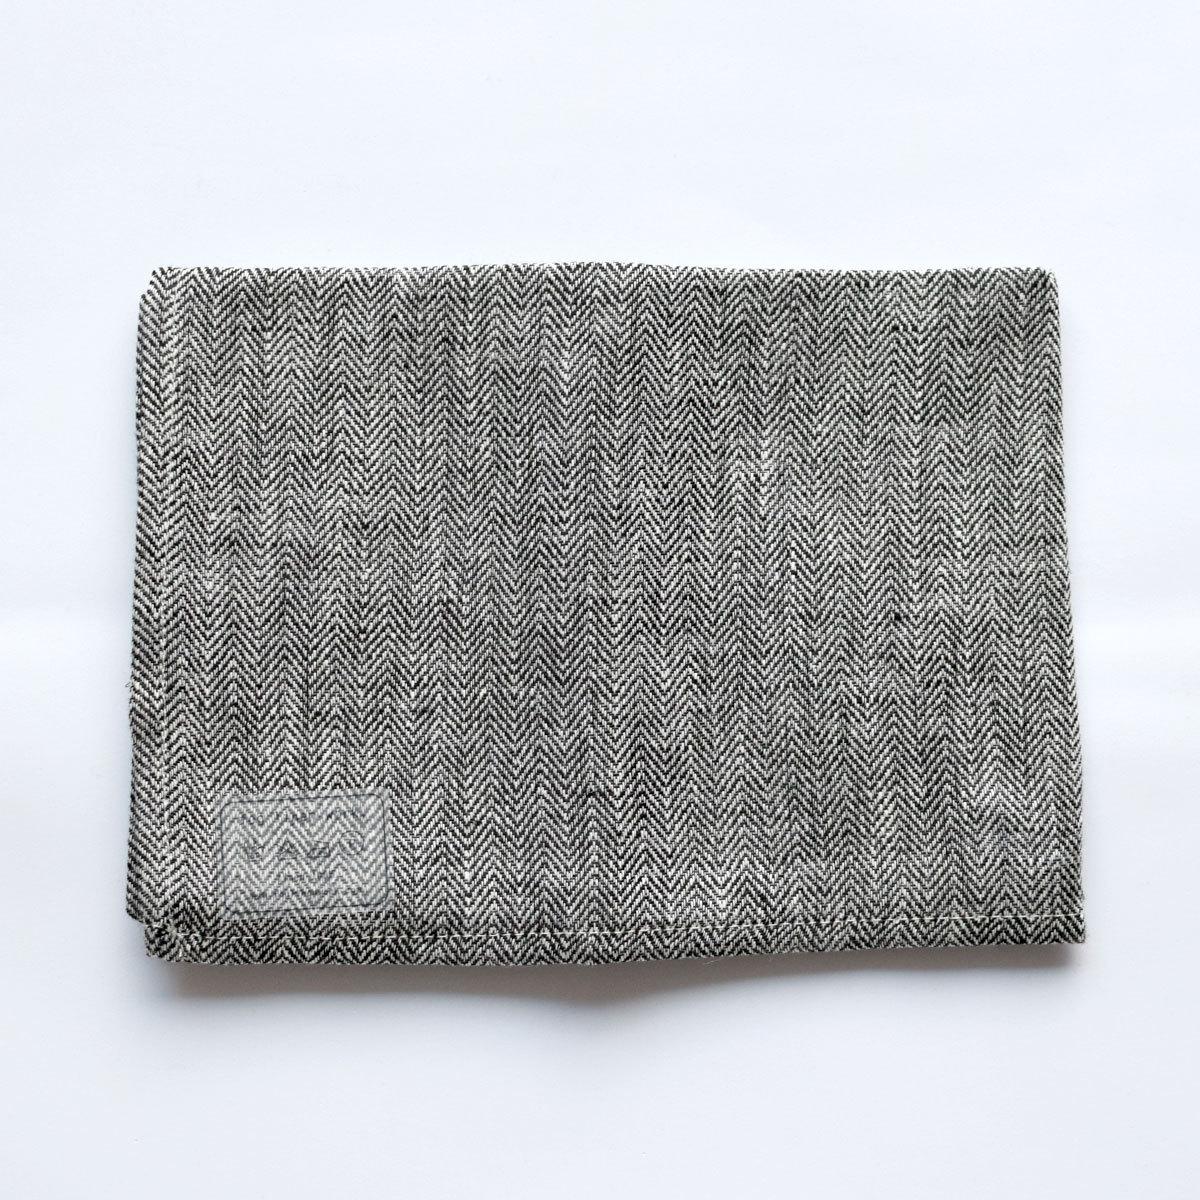 fog linen work(フォグリネンワーク)リネンキッチンクロス ヘリンボーンブラック